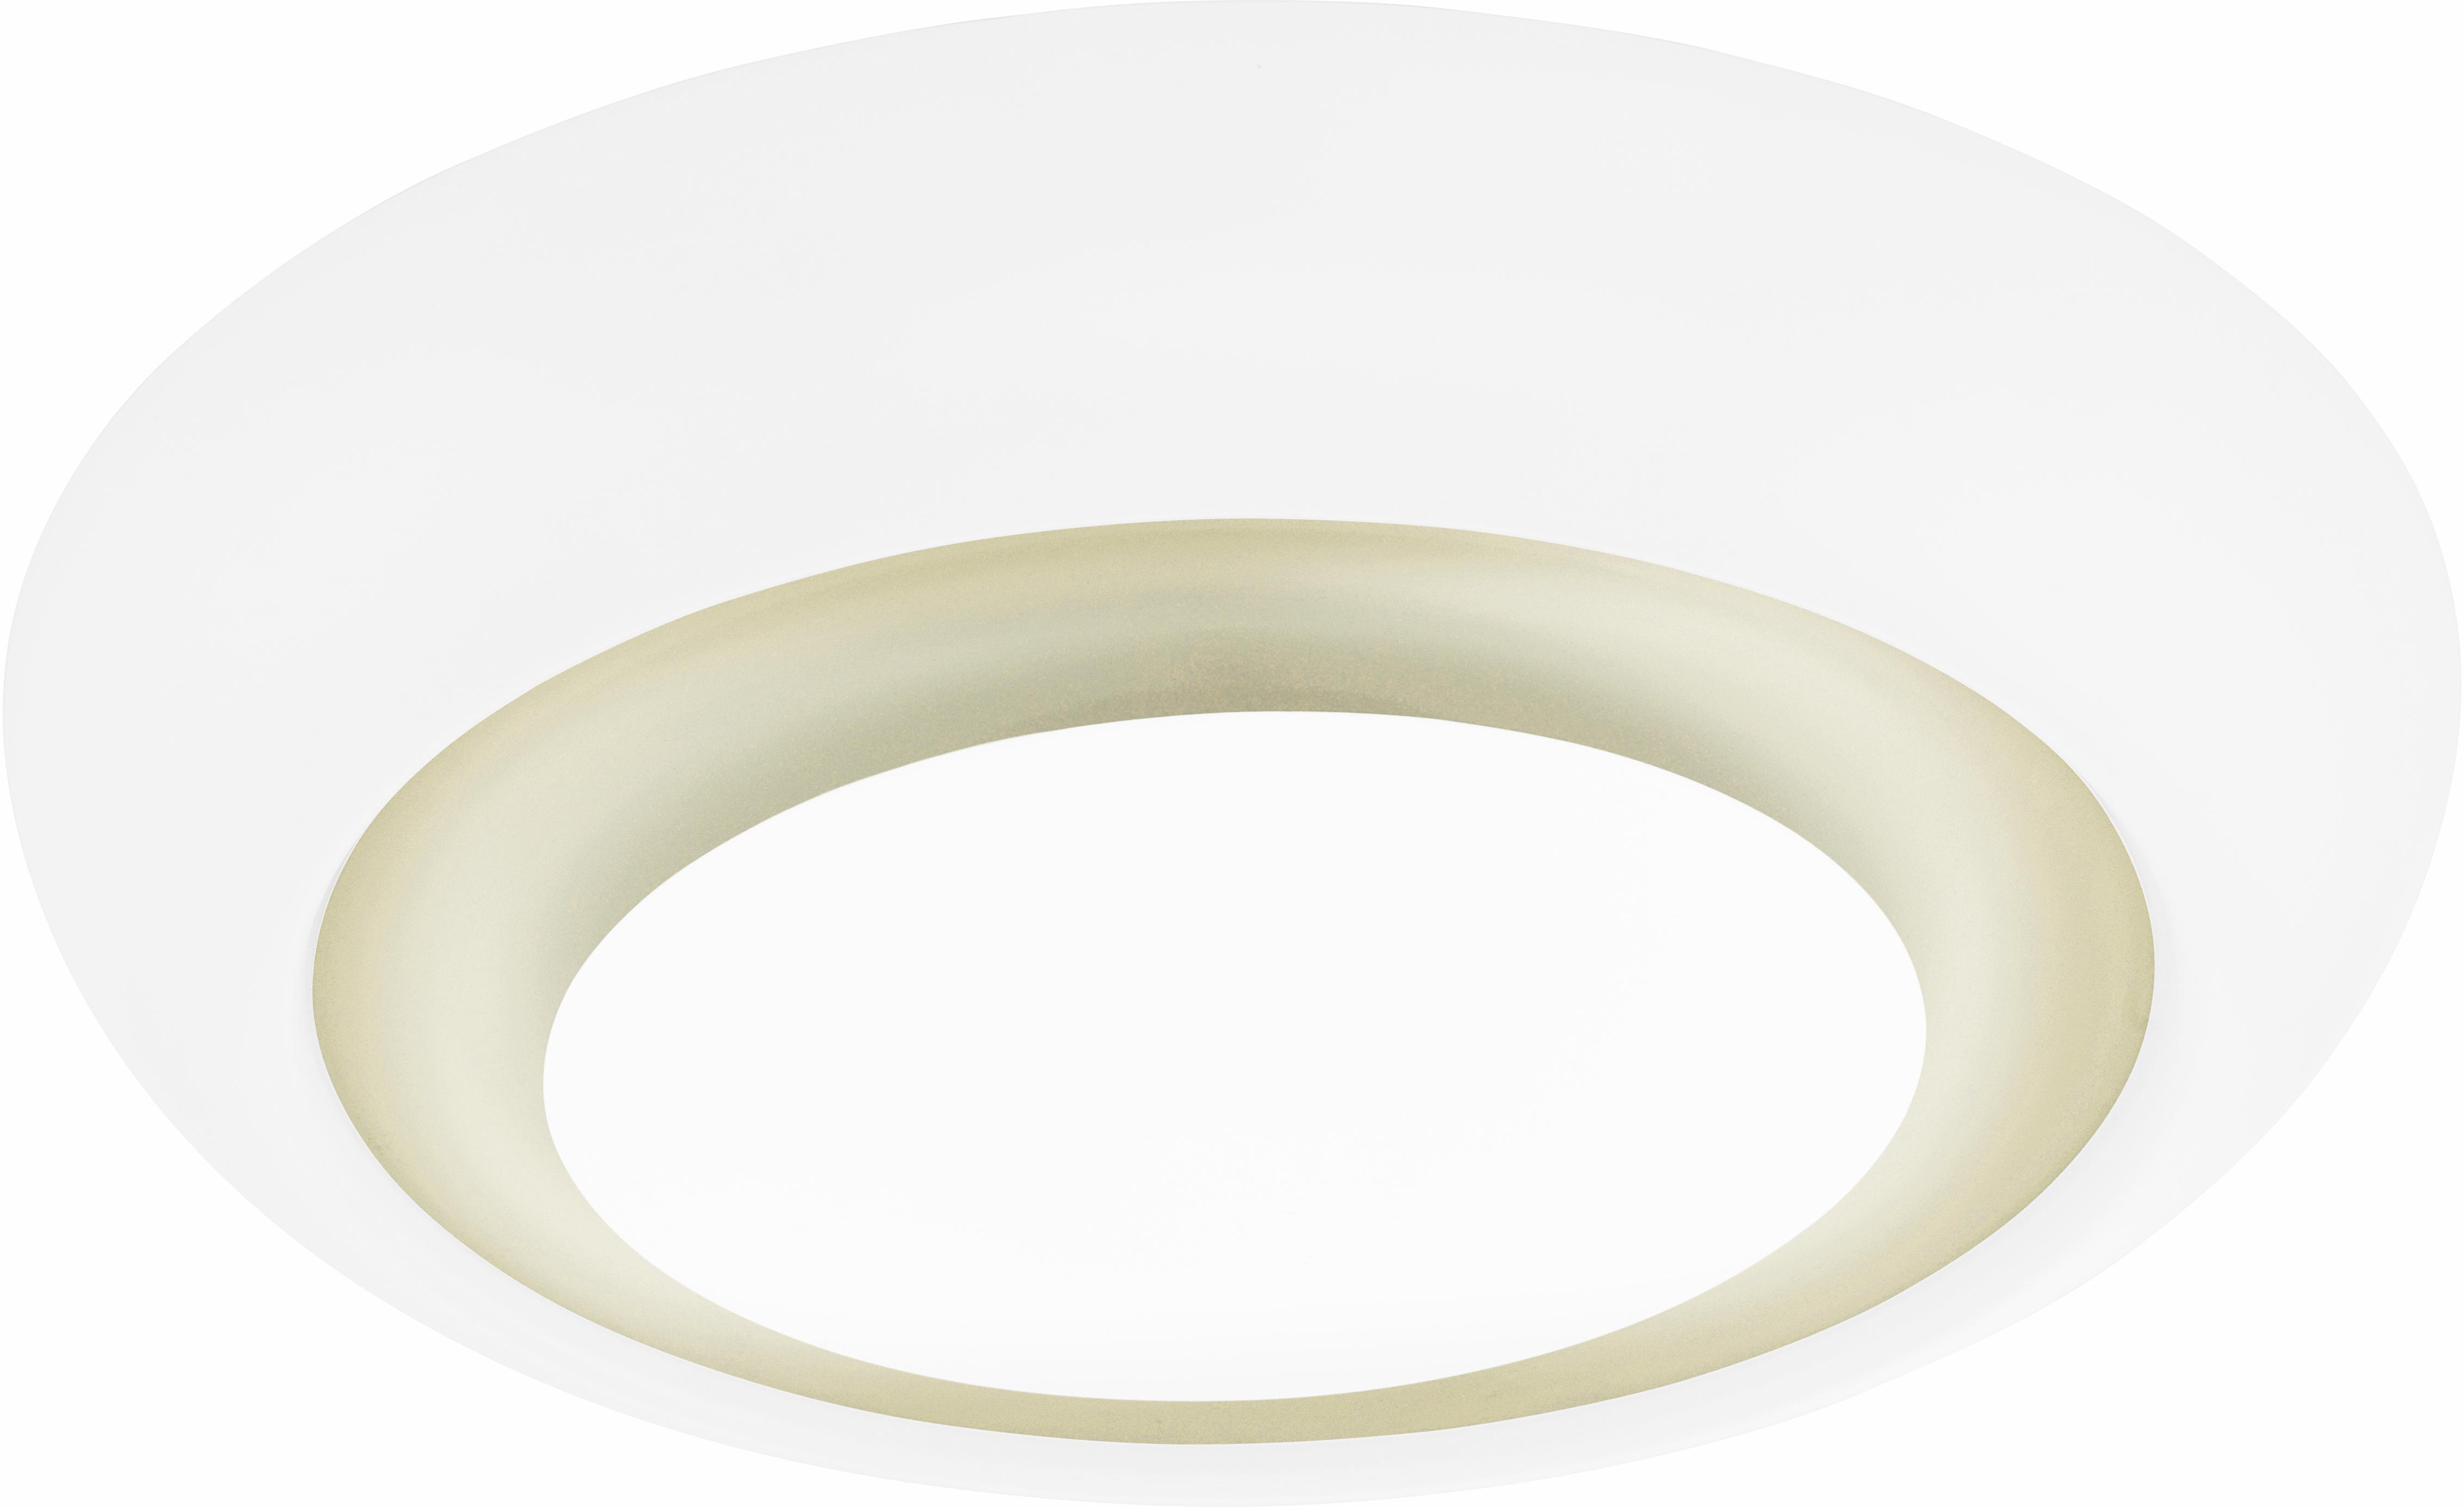 EGLO LED Deckenleuchte CANUMA